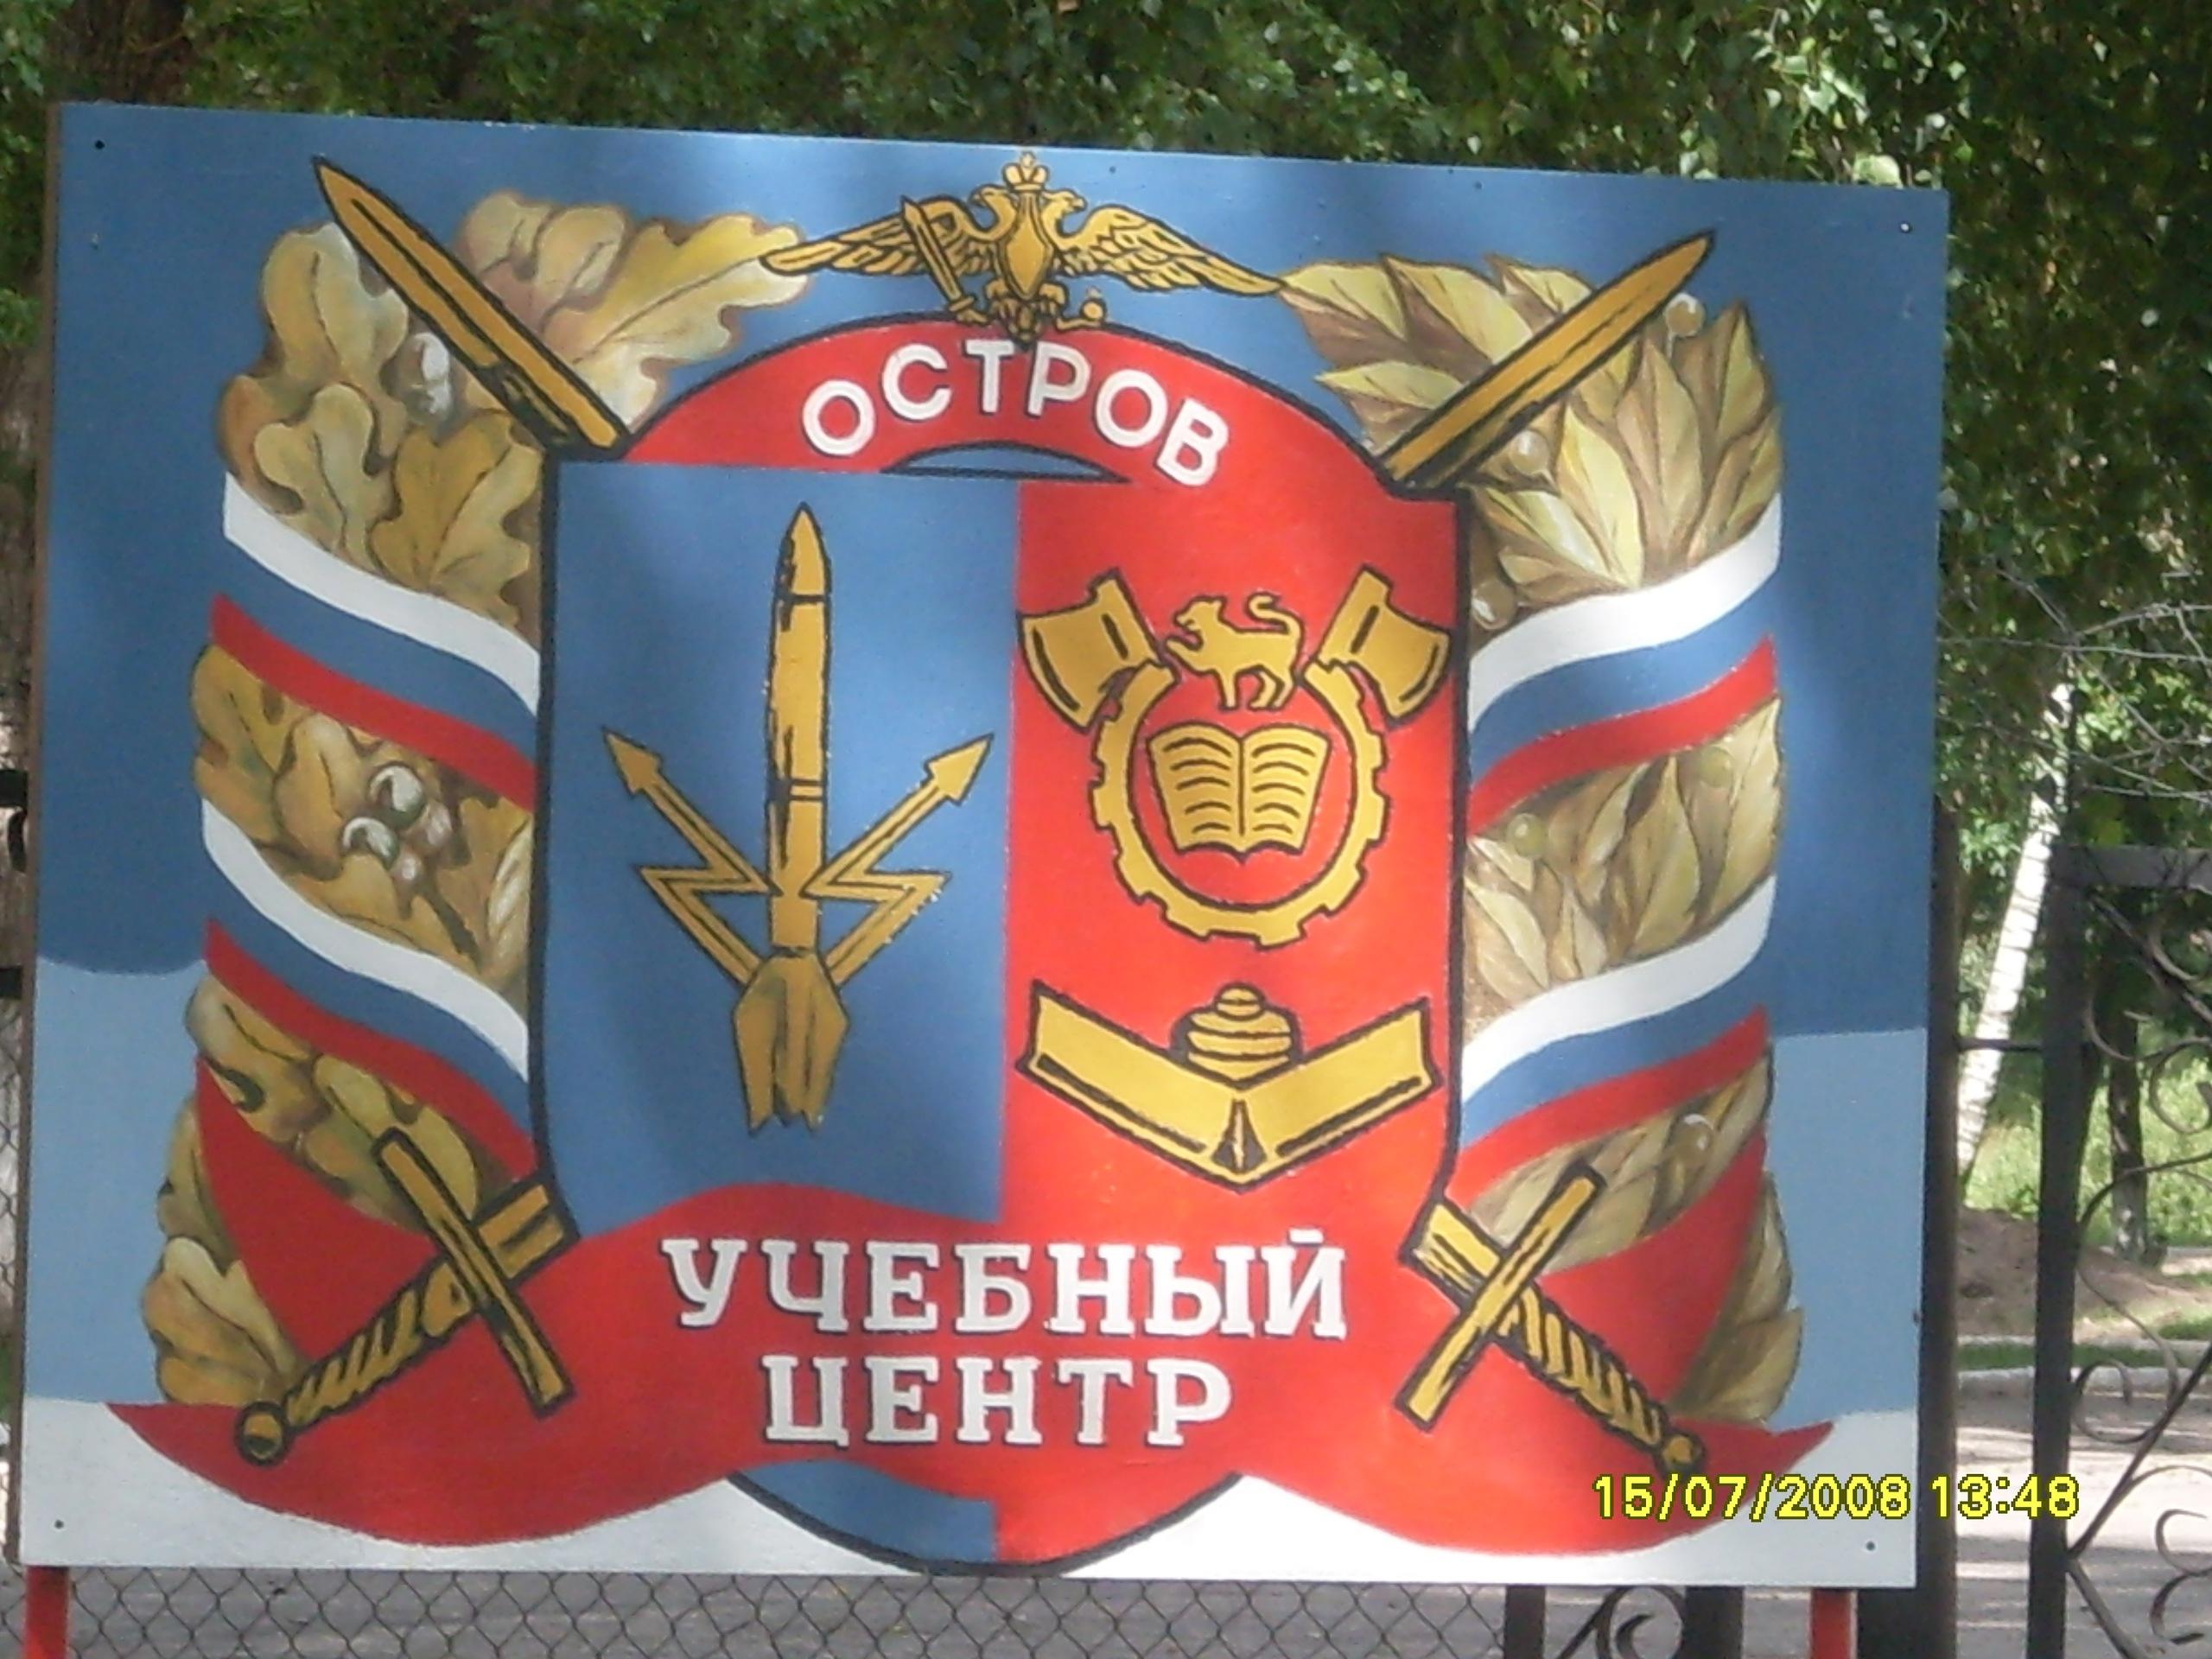 Фото вч 35600: http://etsphoto.ru/foto-vych-35600.html